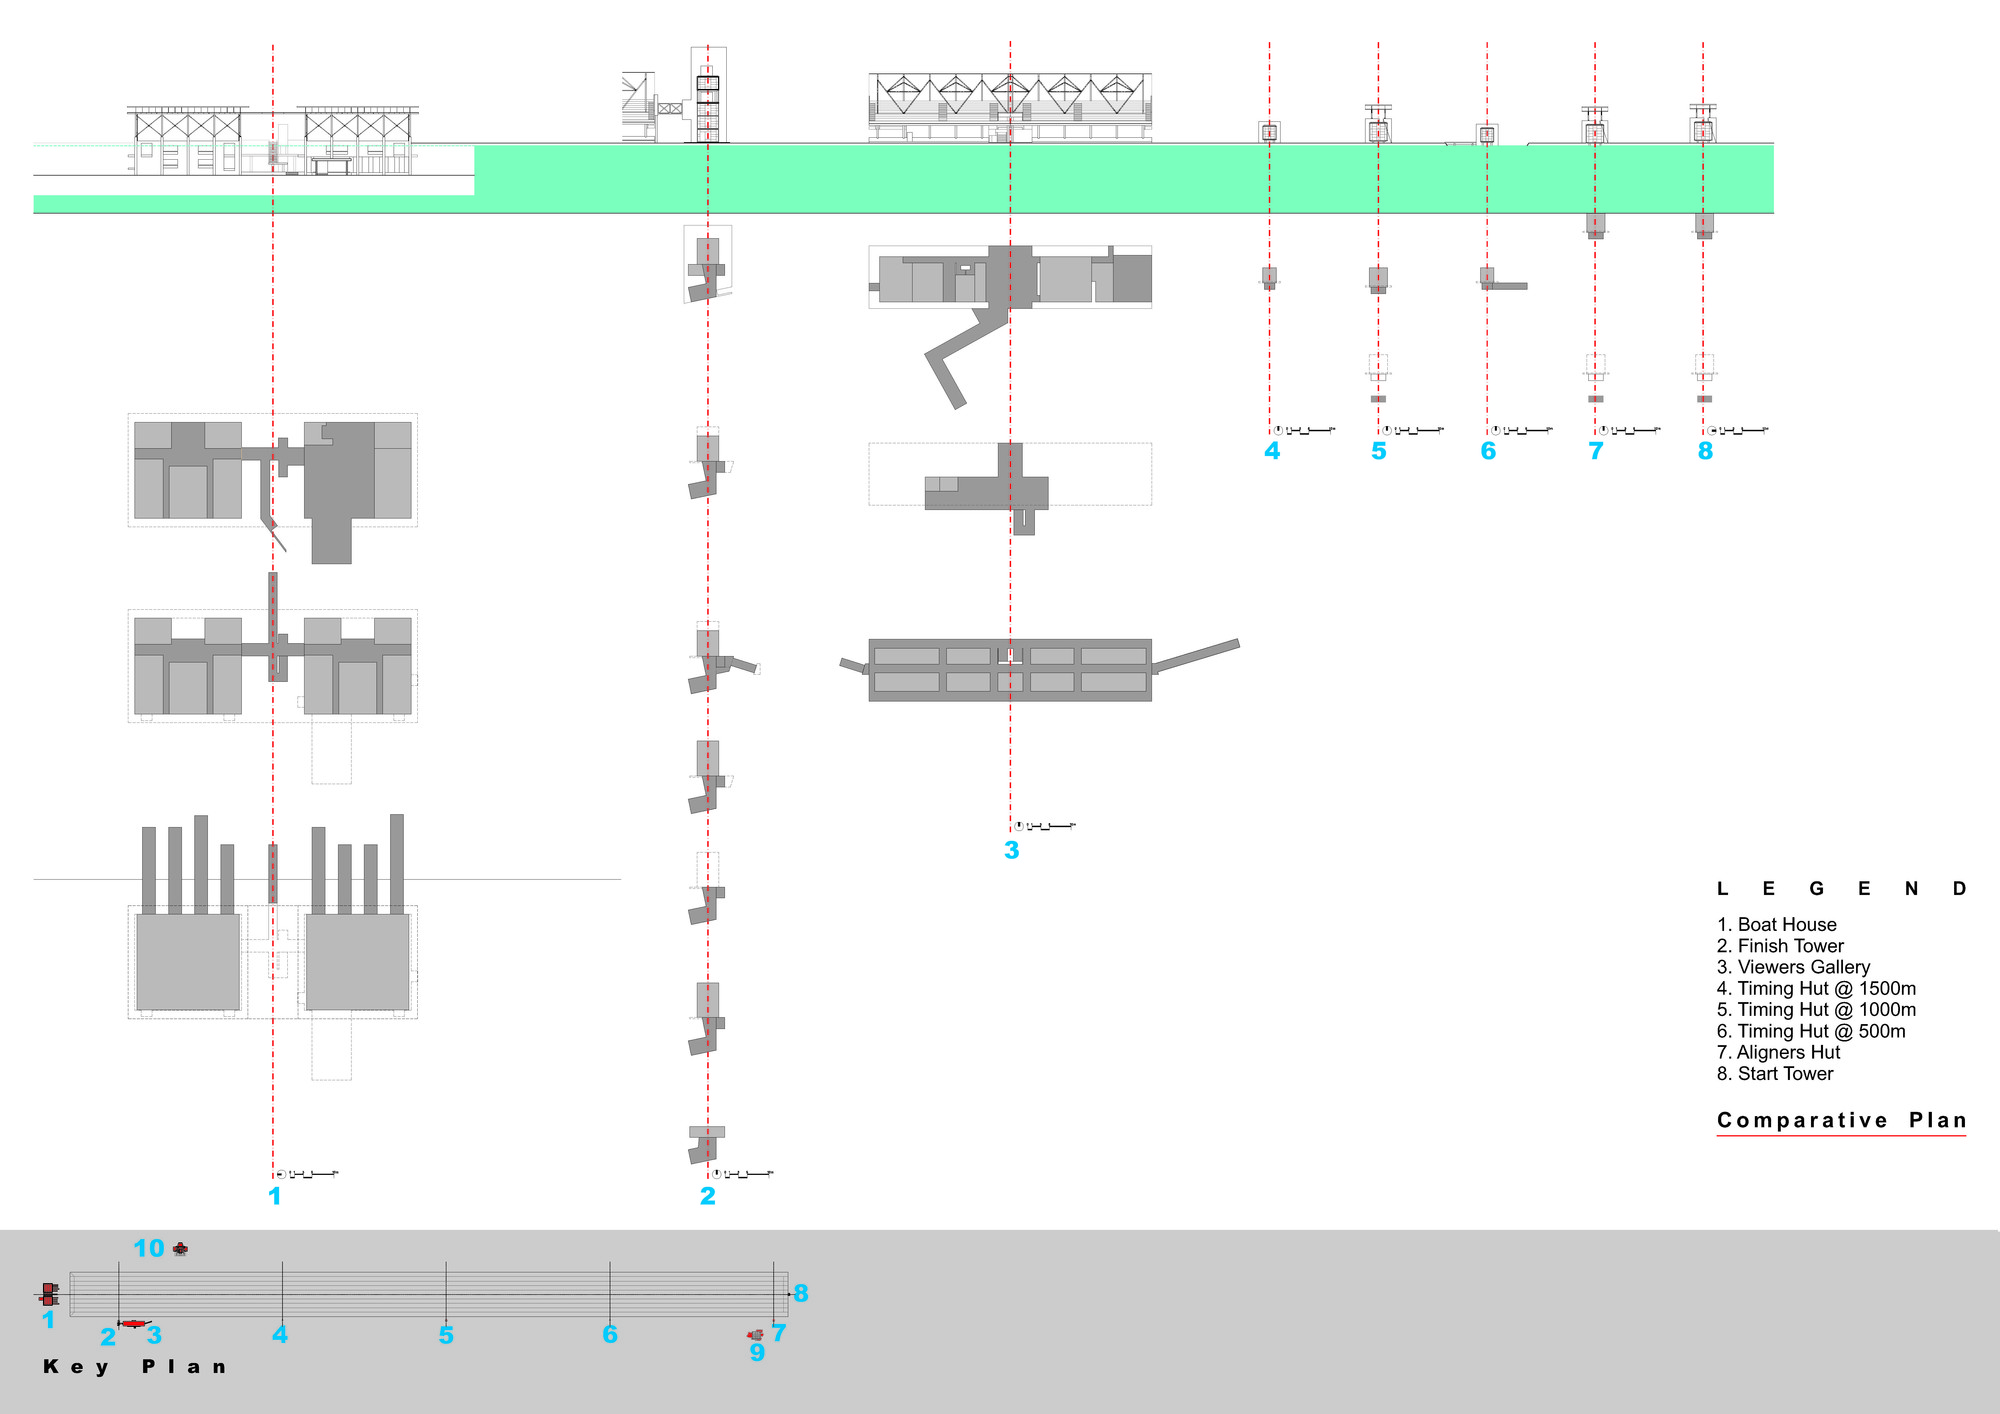 medium resolution of army rowing node diagram